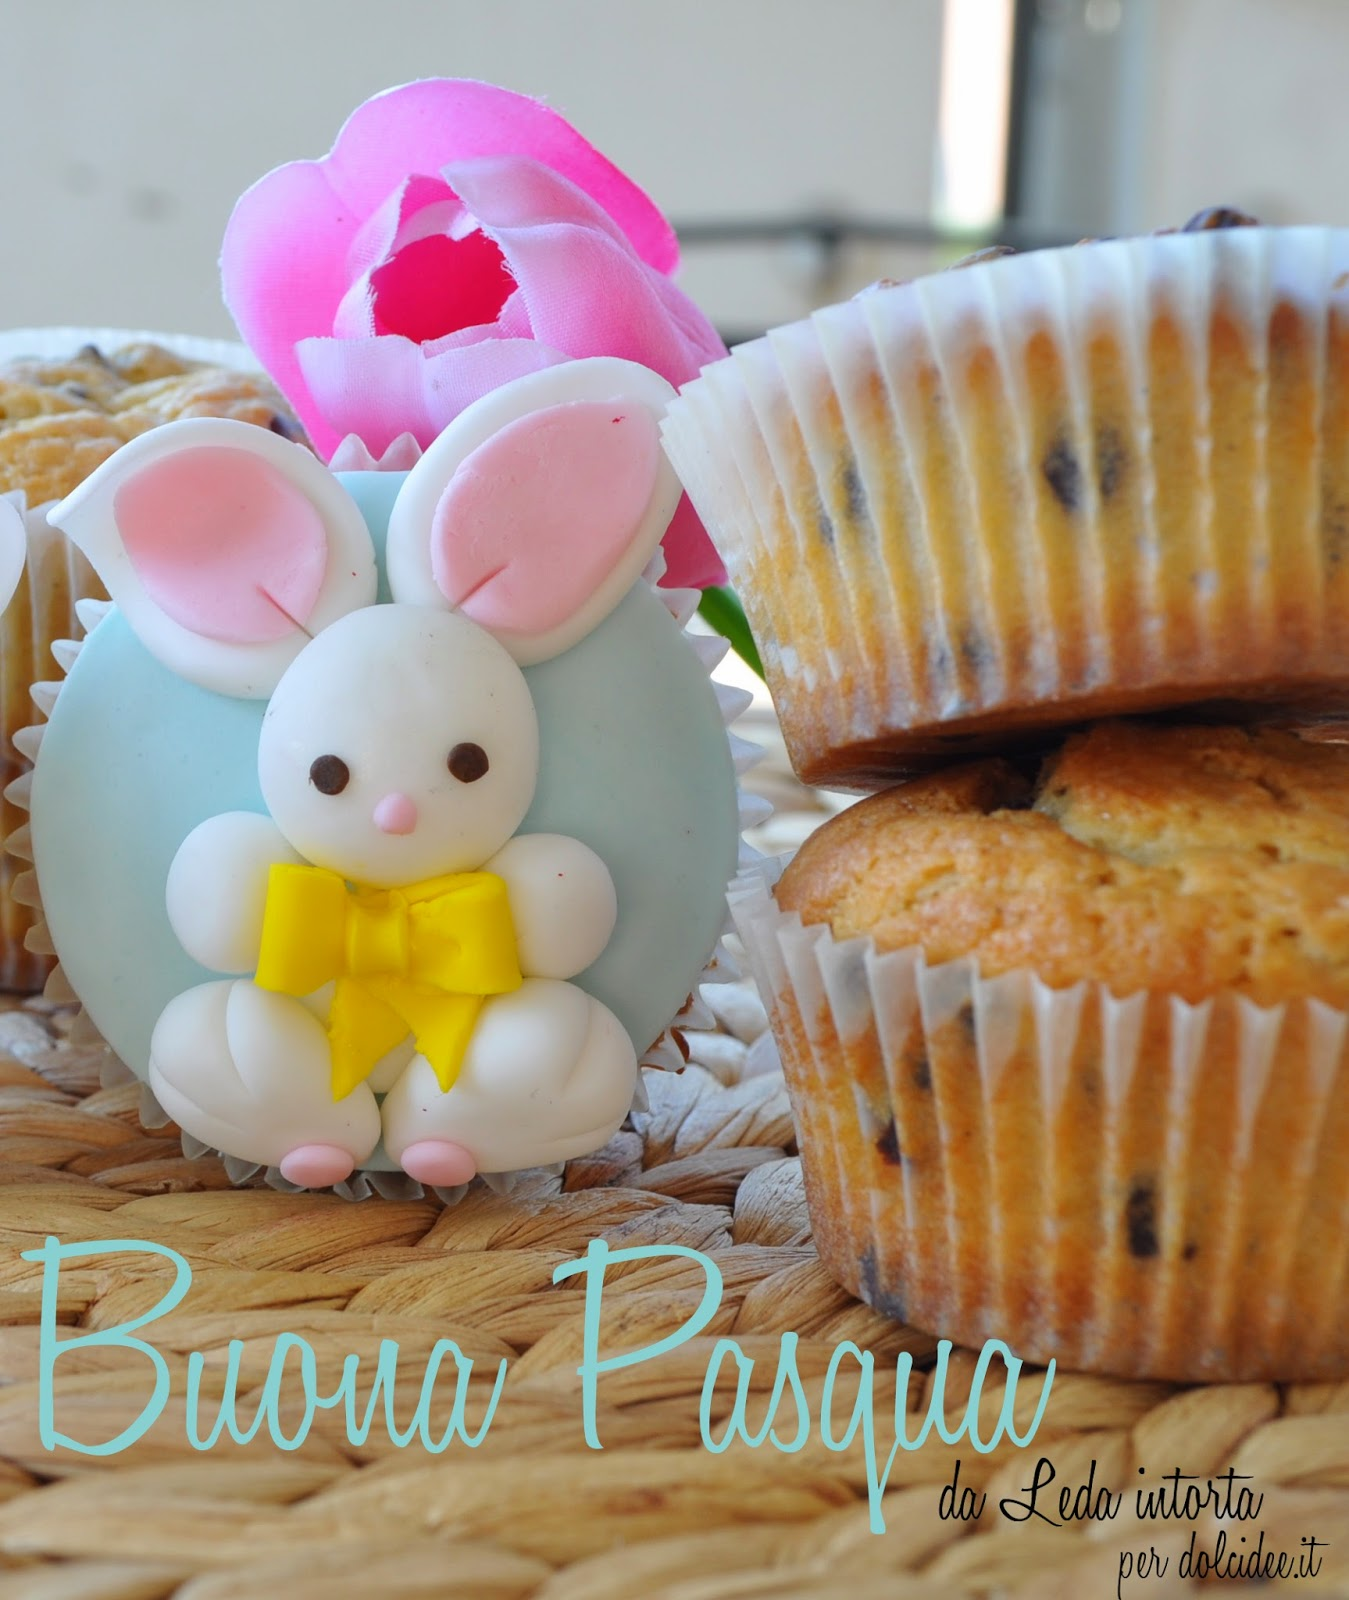 Leda intorta, dolci di Pasqua, tutorial cake design, dolcidee.it